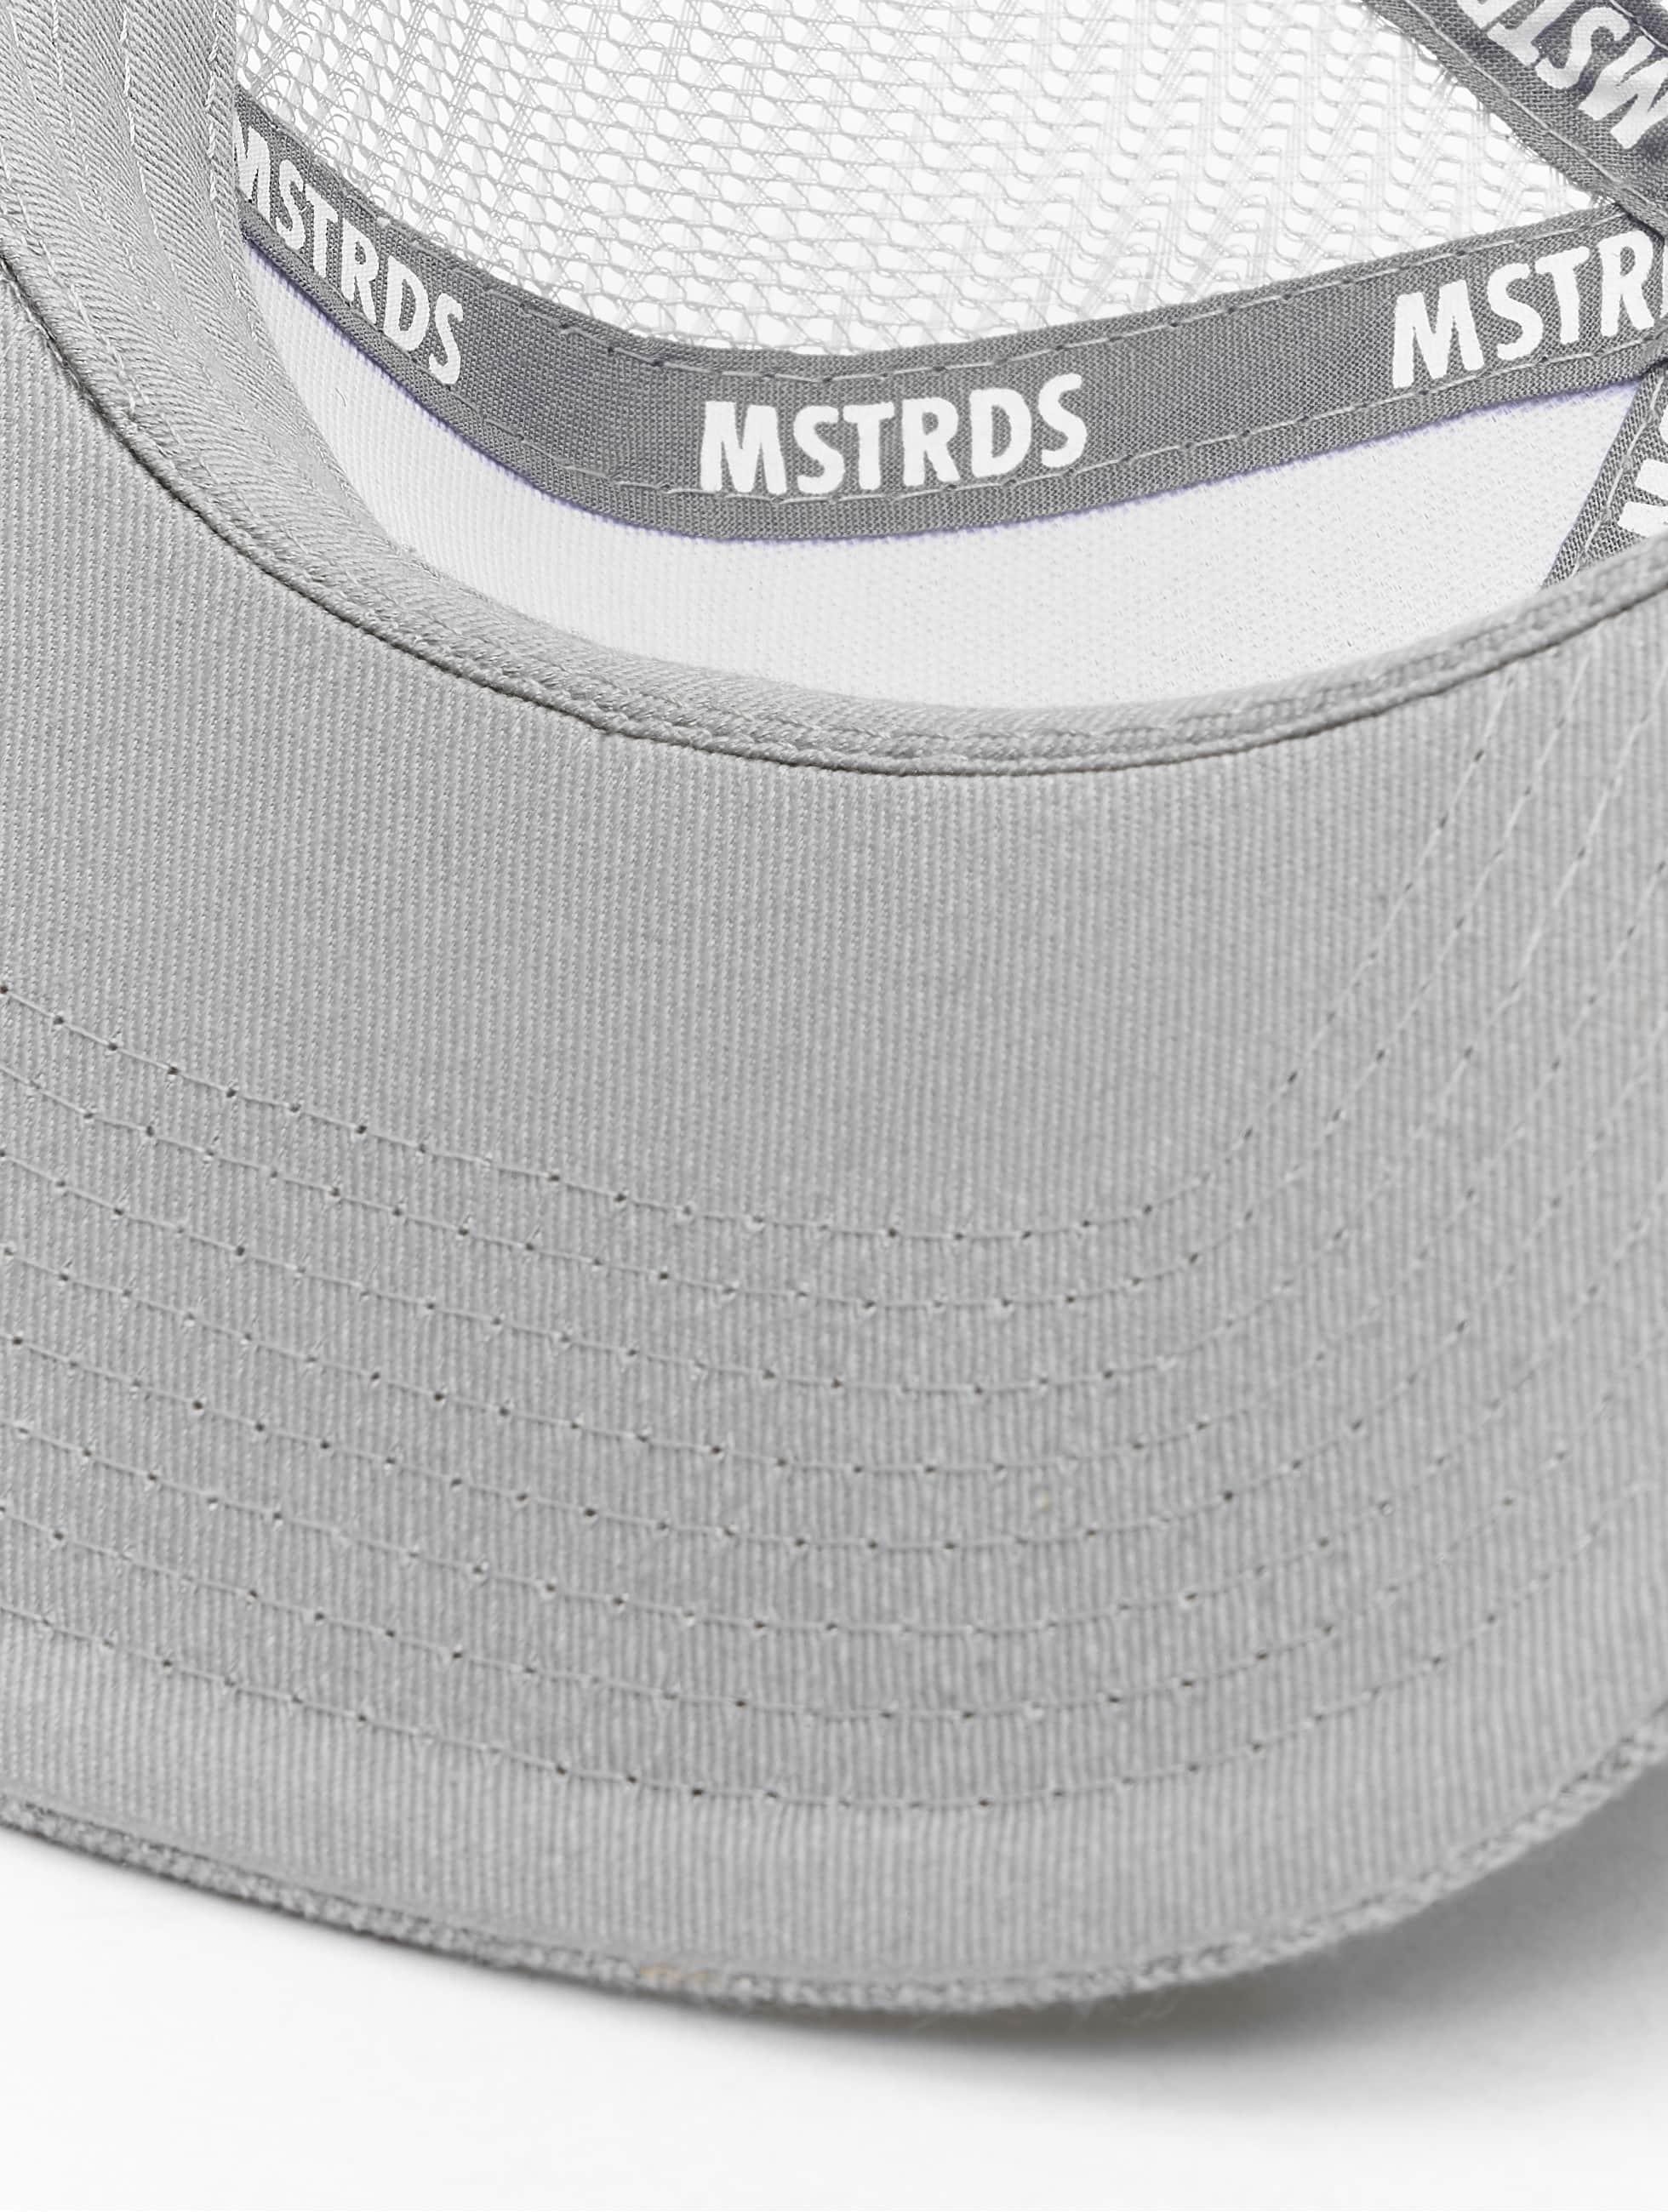 MSTRDS Trucker Caps Money Clip szary